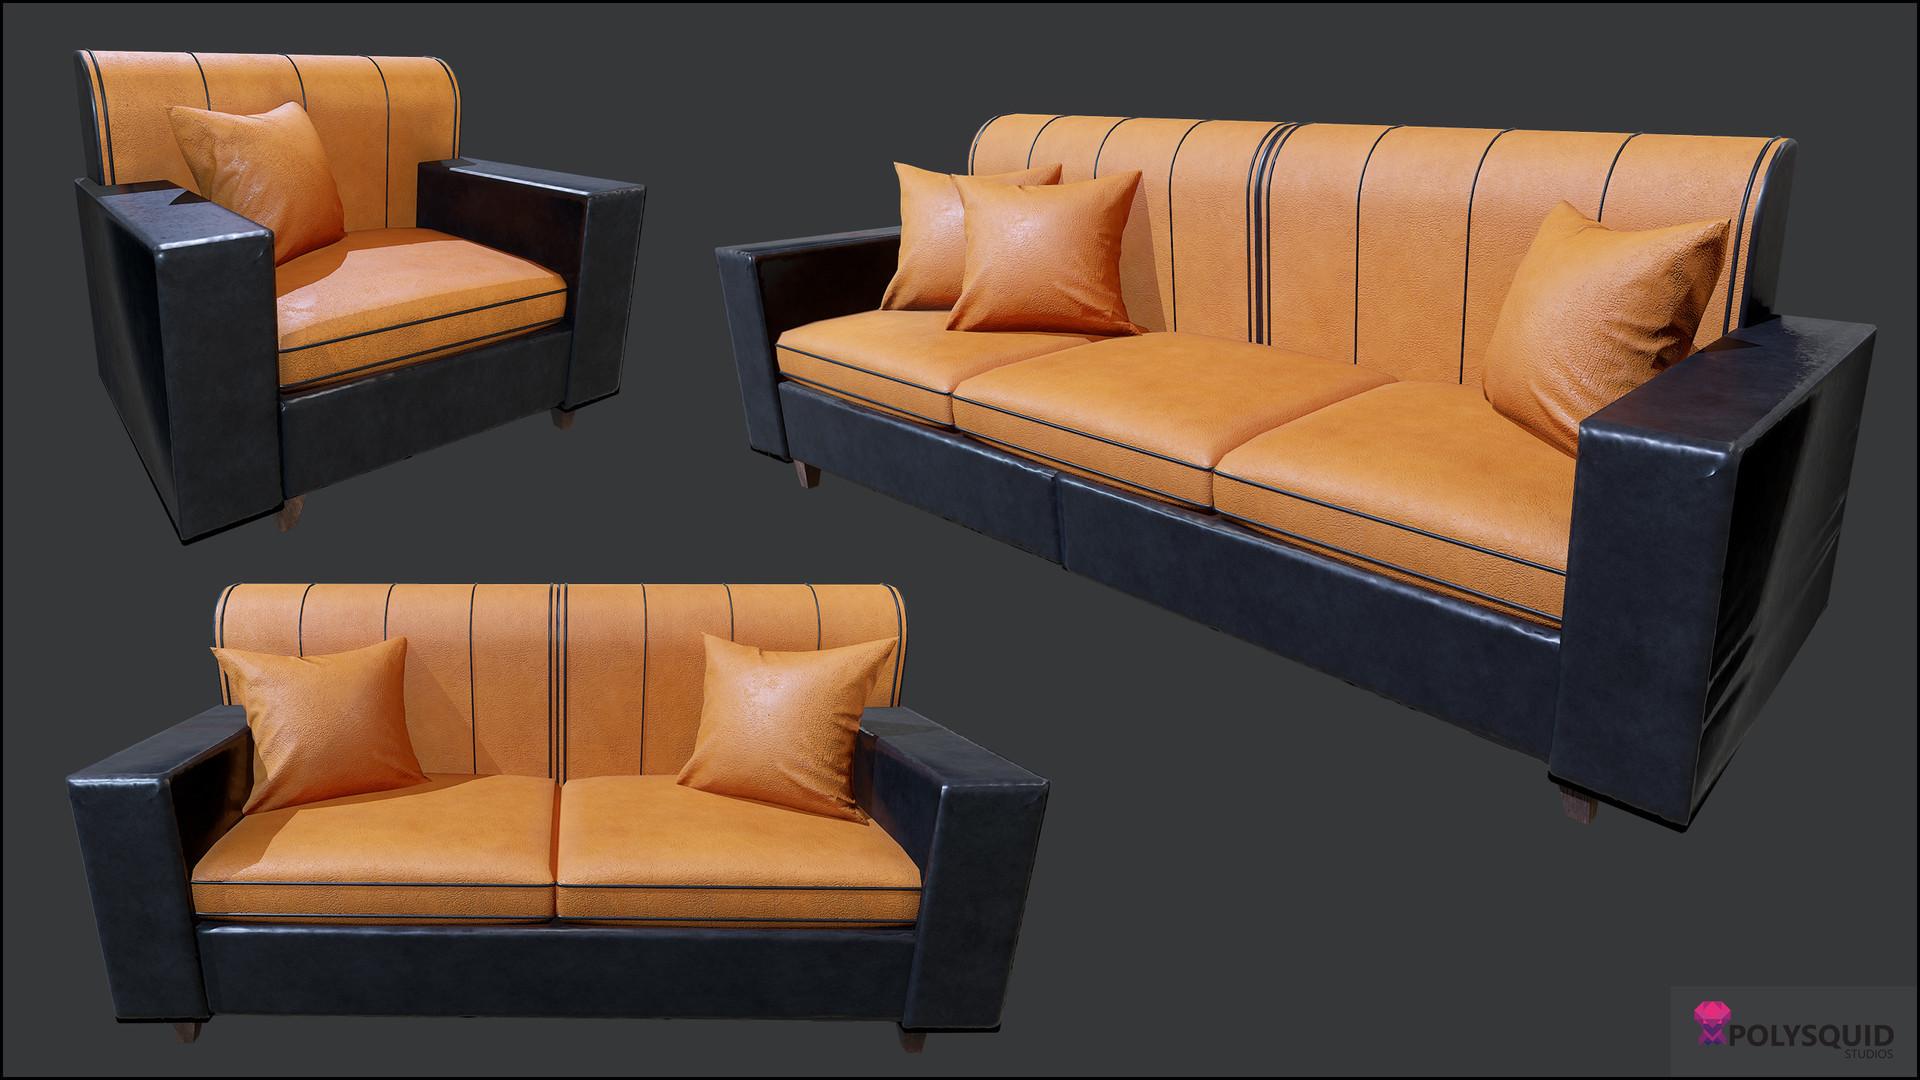 Poly squid florin bisca modular sofa